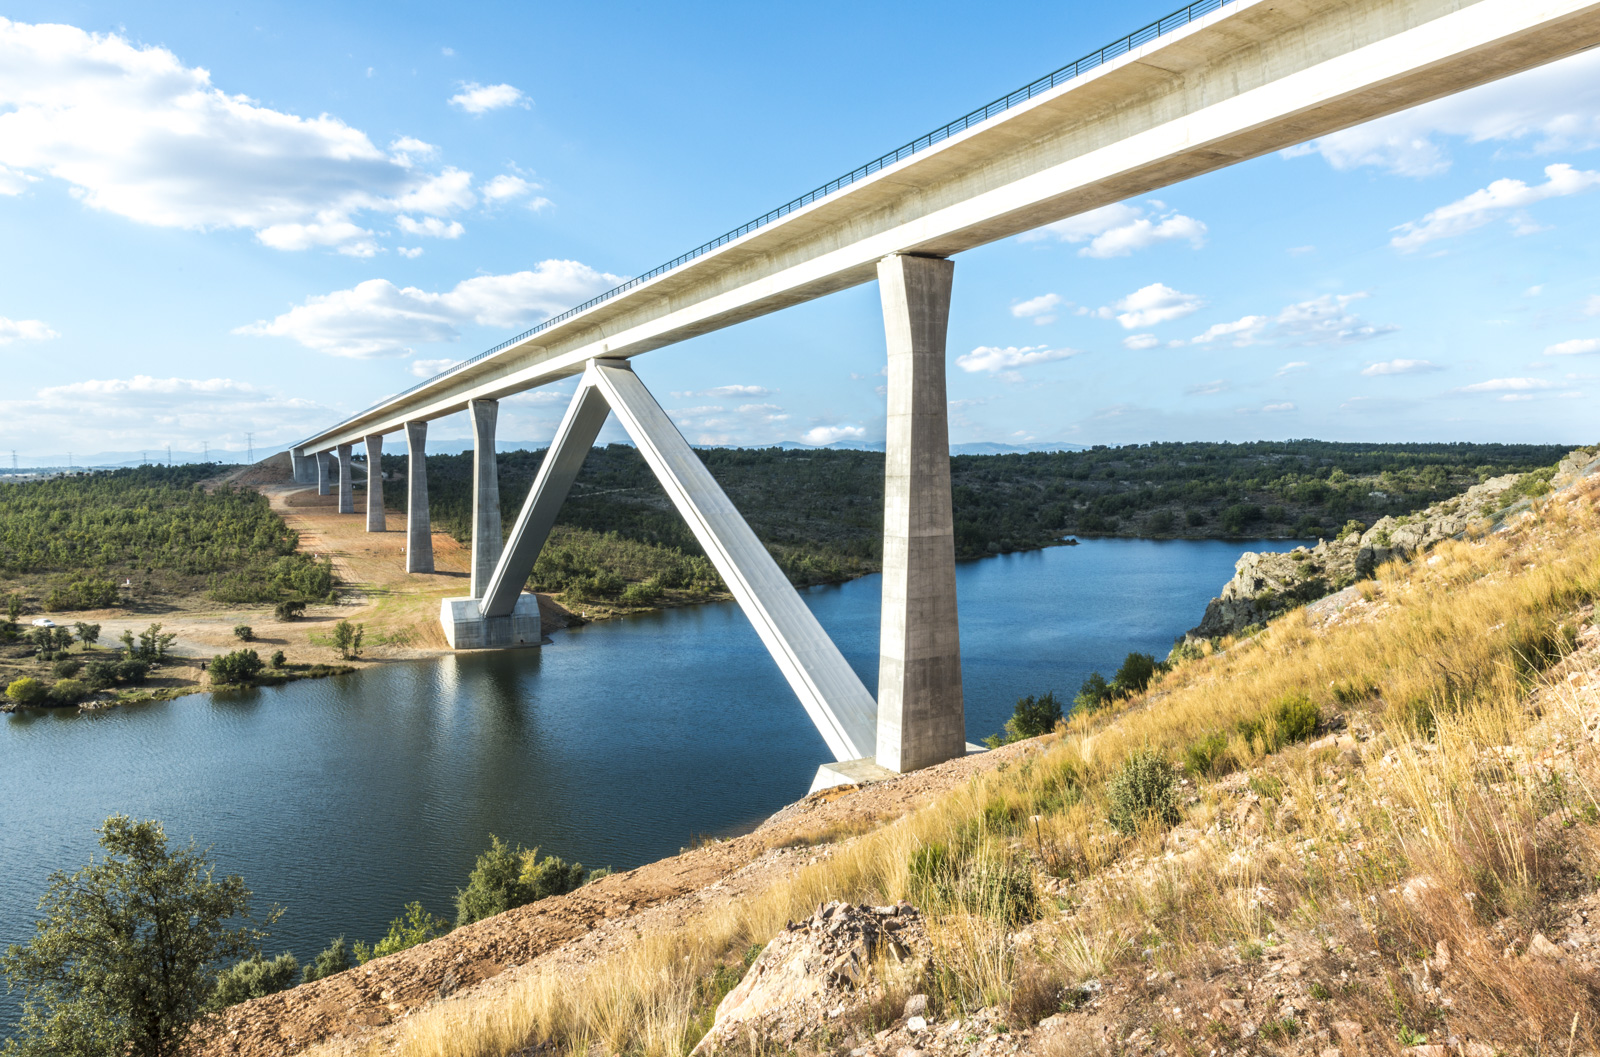 20141001-174827-CFCSL_Viaducto_del_Tera_Zamora-Editar